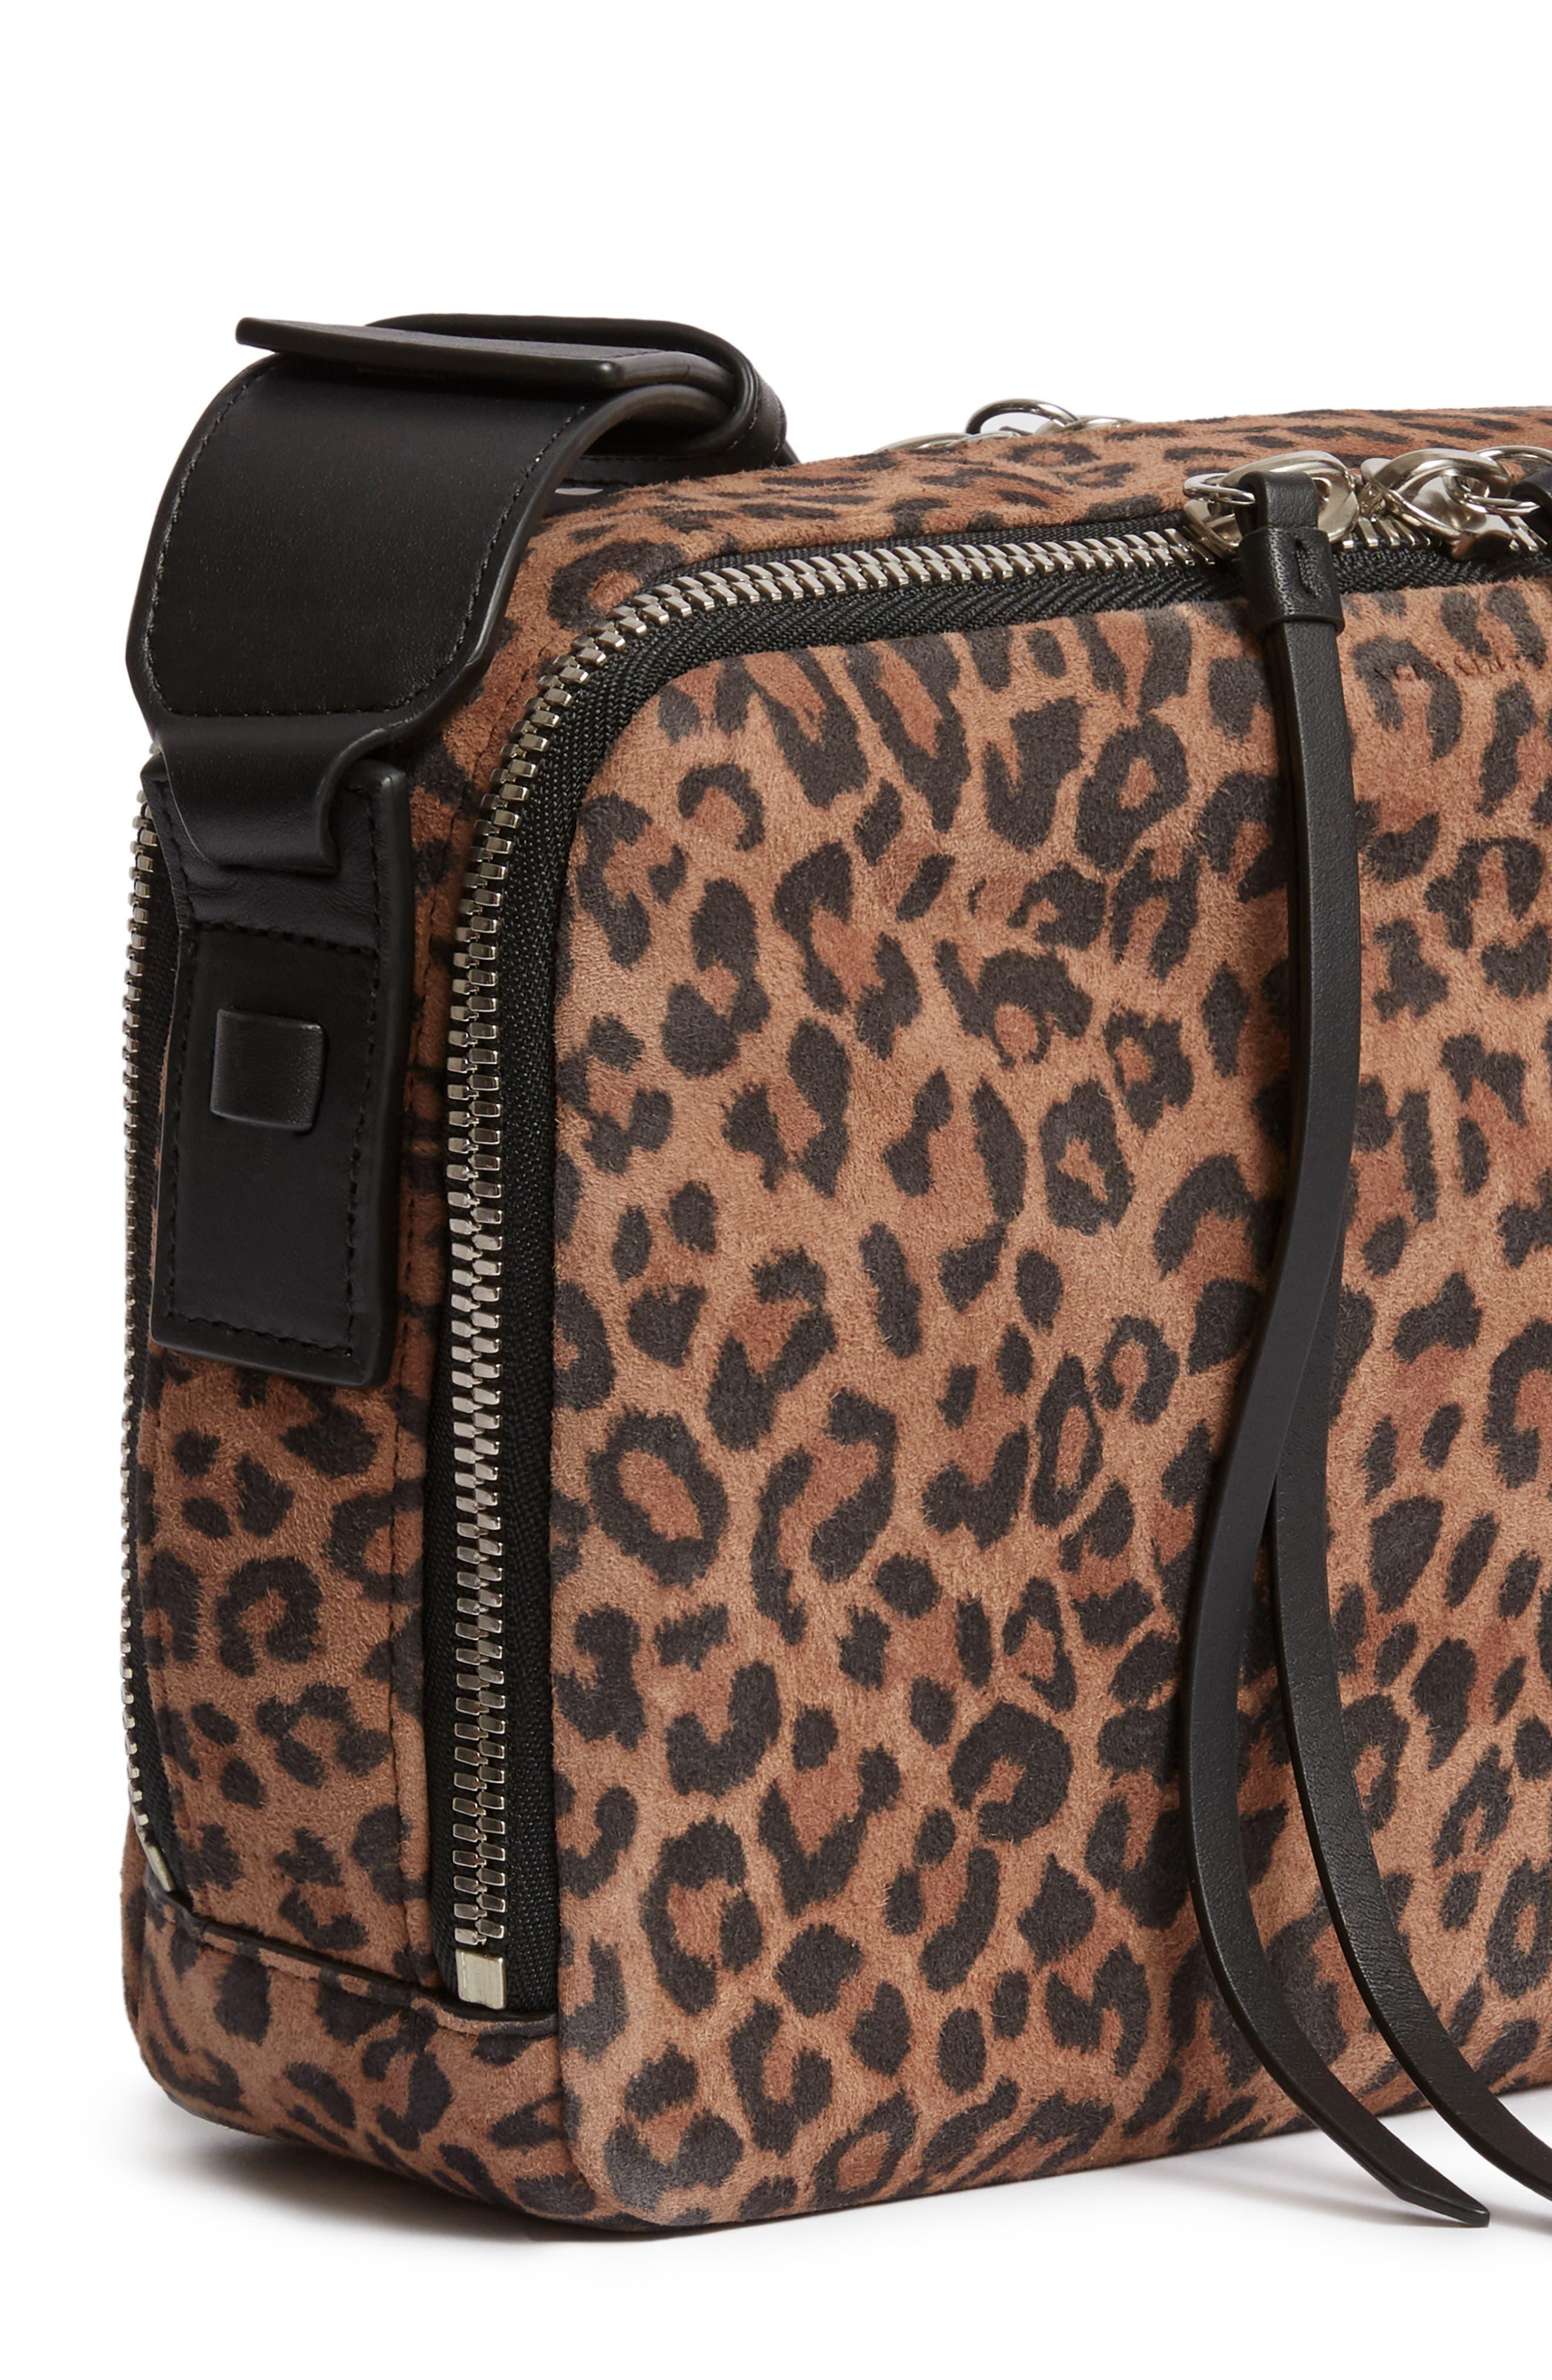 Vincent Leather Crossbody Bag,                             Alternate thumbnail 7, color,                             LEOPARD/ BLACK